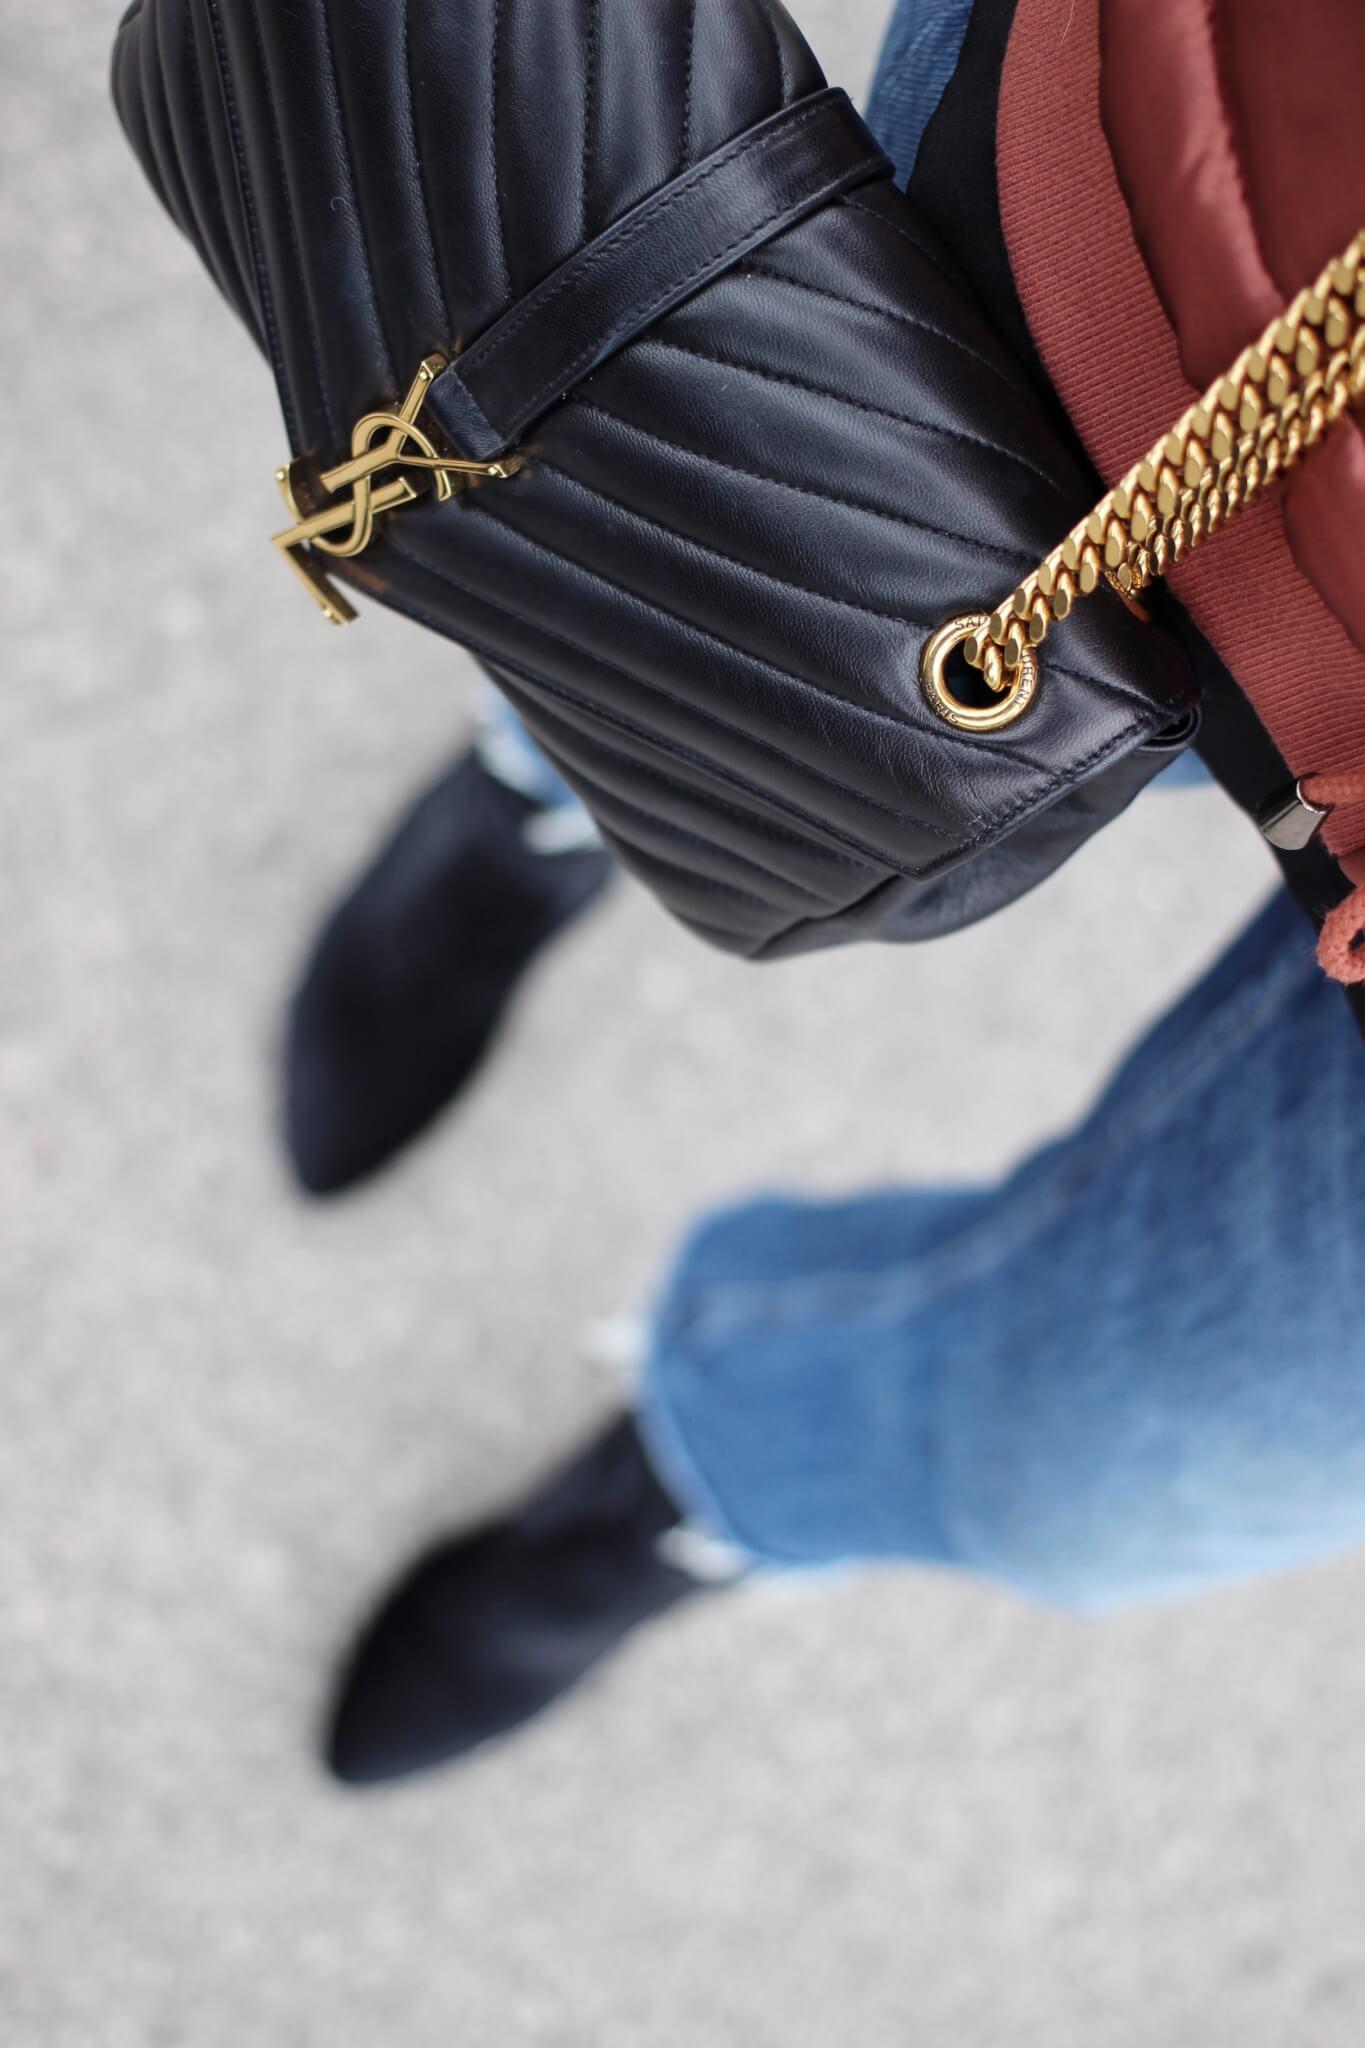 Saint Laurent Handbag on UK Fashion Blog